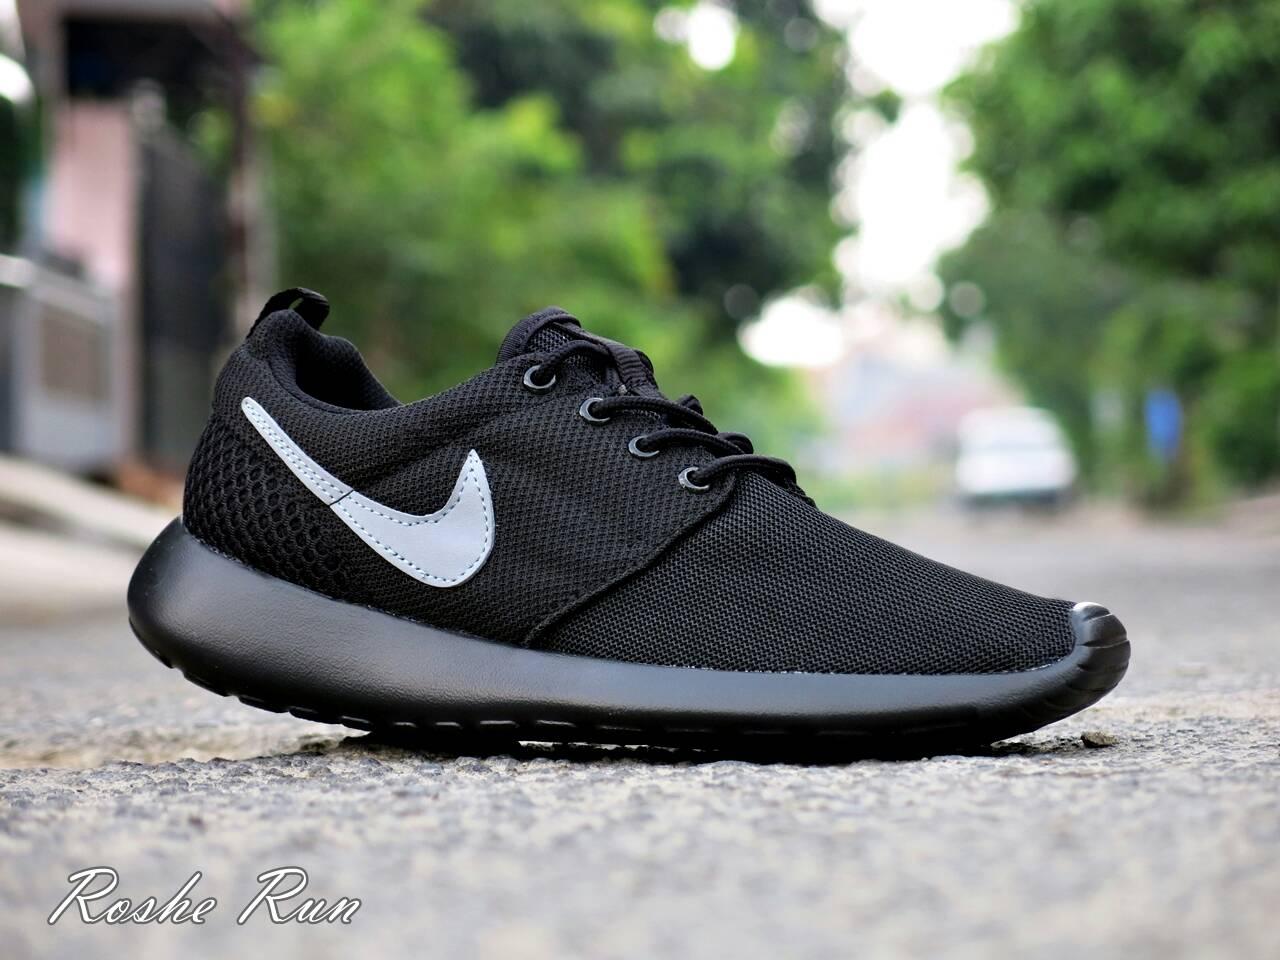 36b4496a54e33 ... top quality jual sepatu sport nike roshe run hitam abu abu olahraga  running joging lapak sepatu